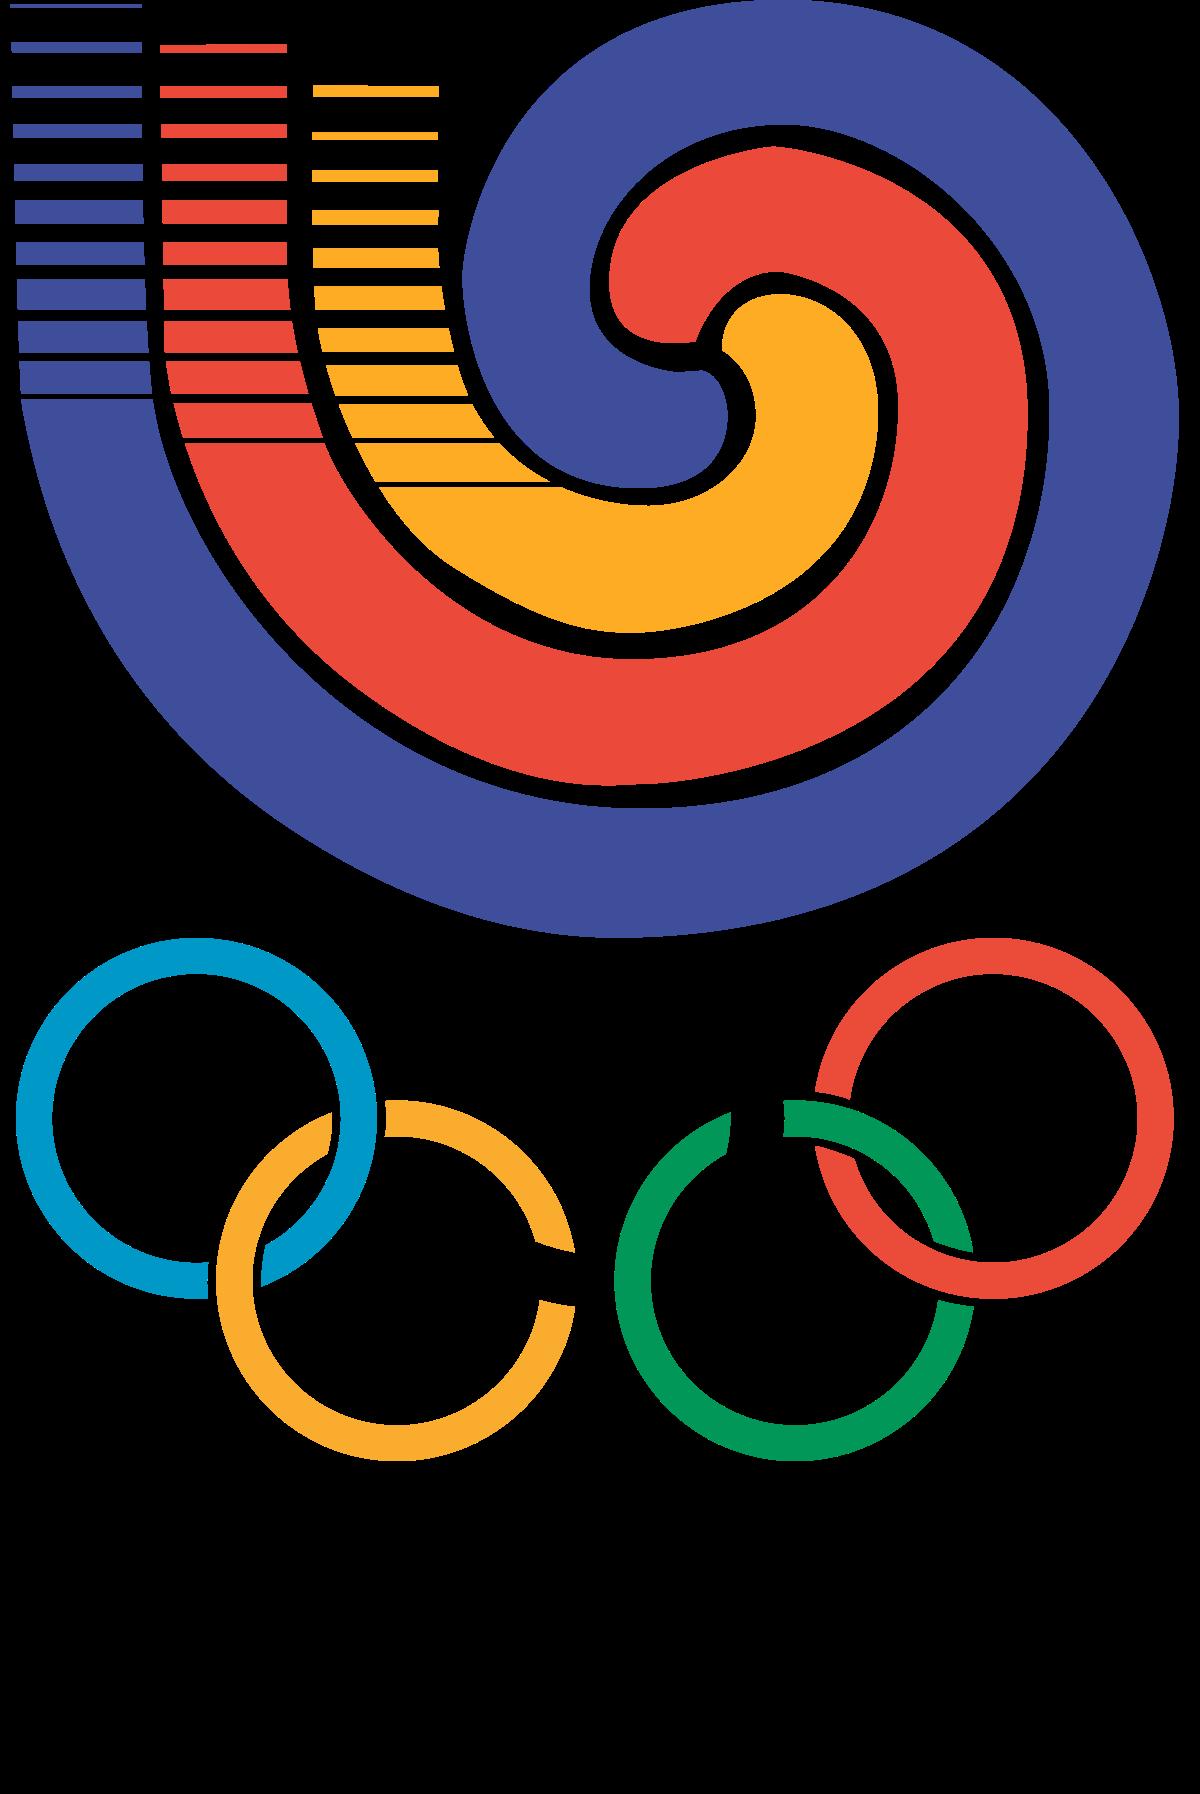 1988 Summer Olympics.